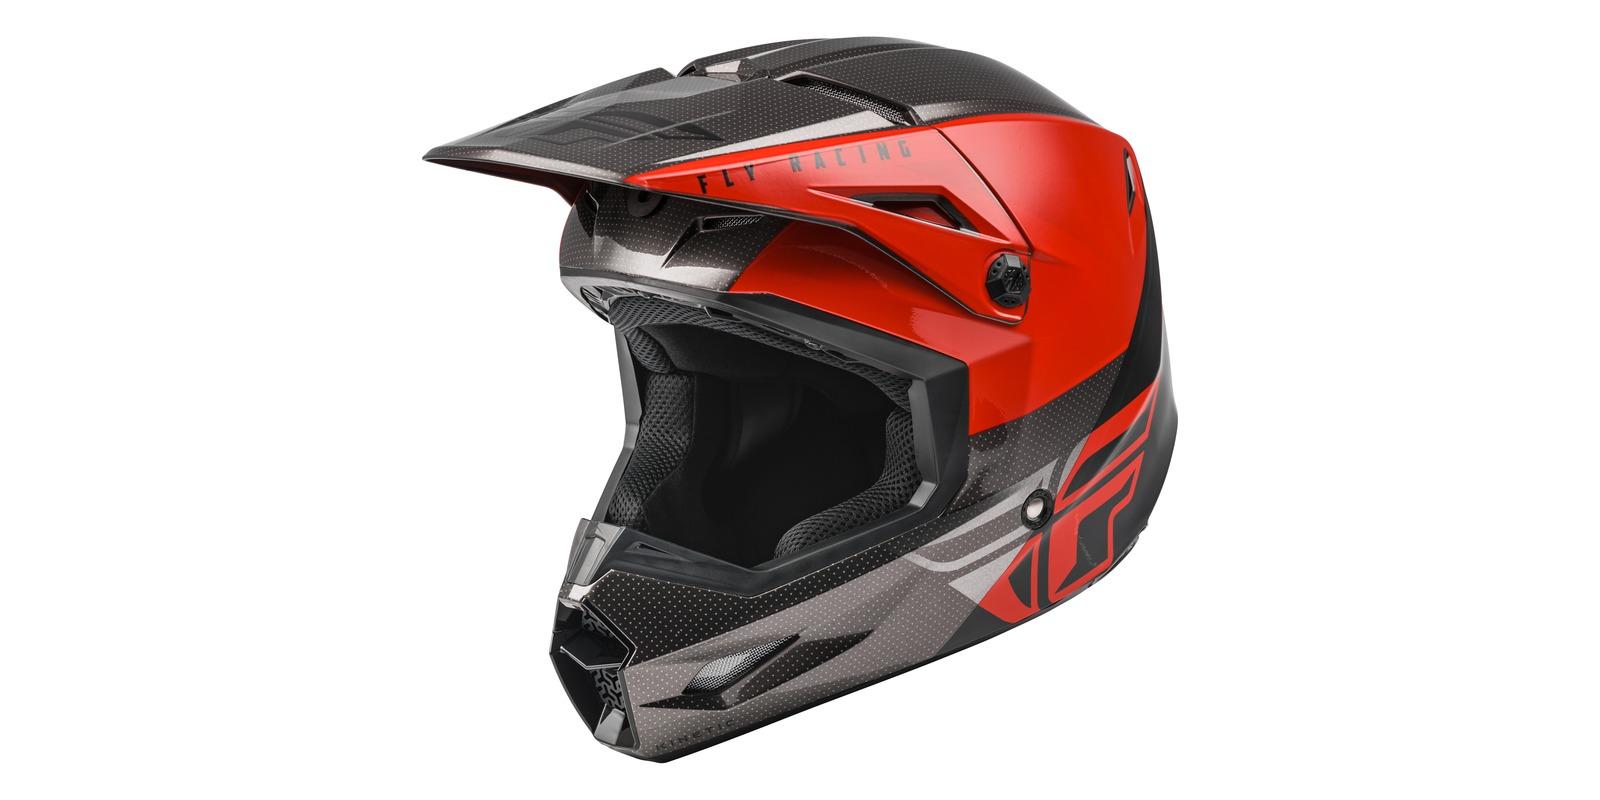 prilba-kinetic-straight-fly-racing-cervena-cerna-seda-_i457680 MOTO ADAMEK